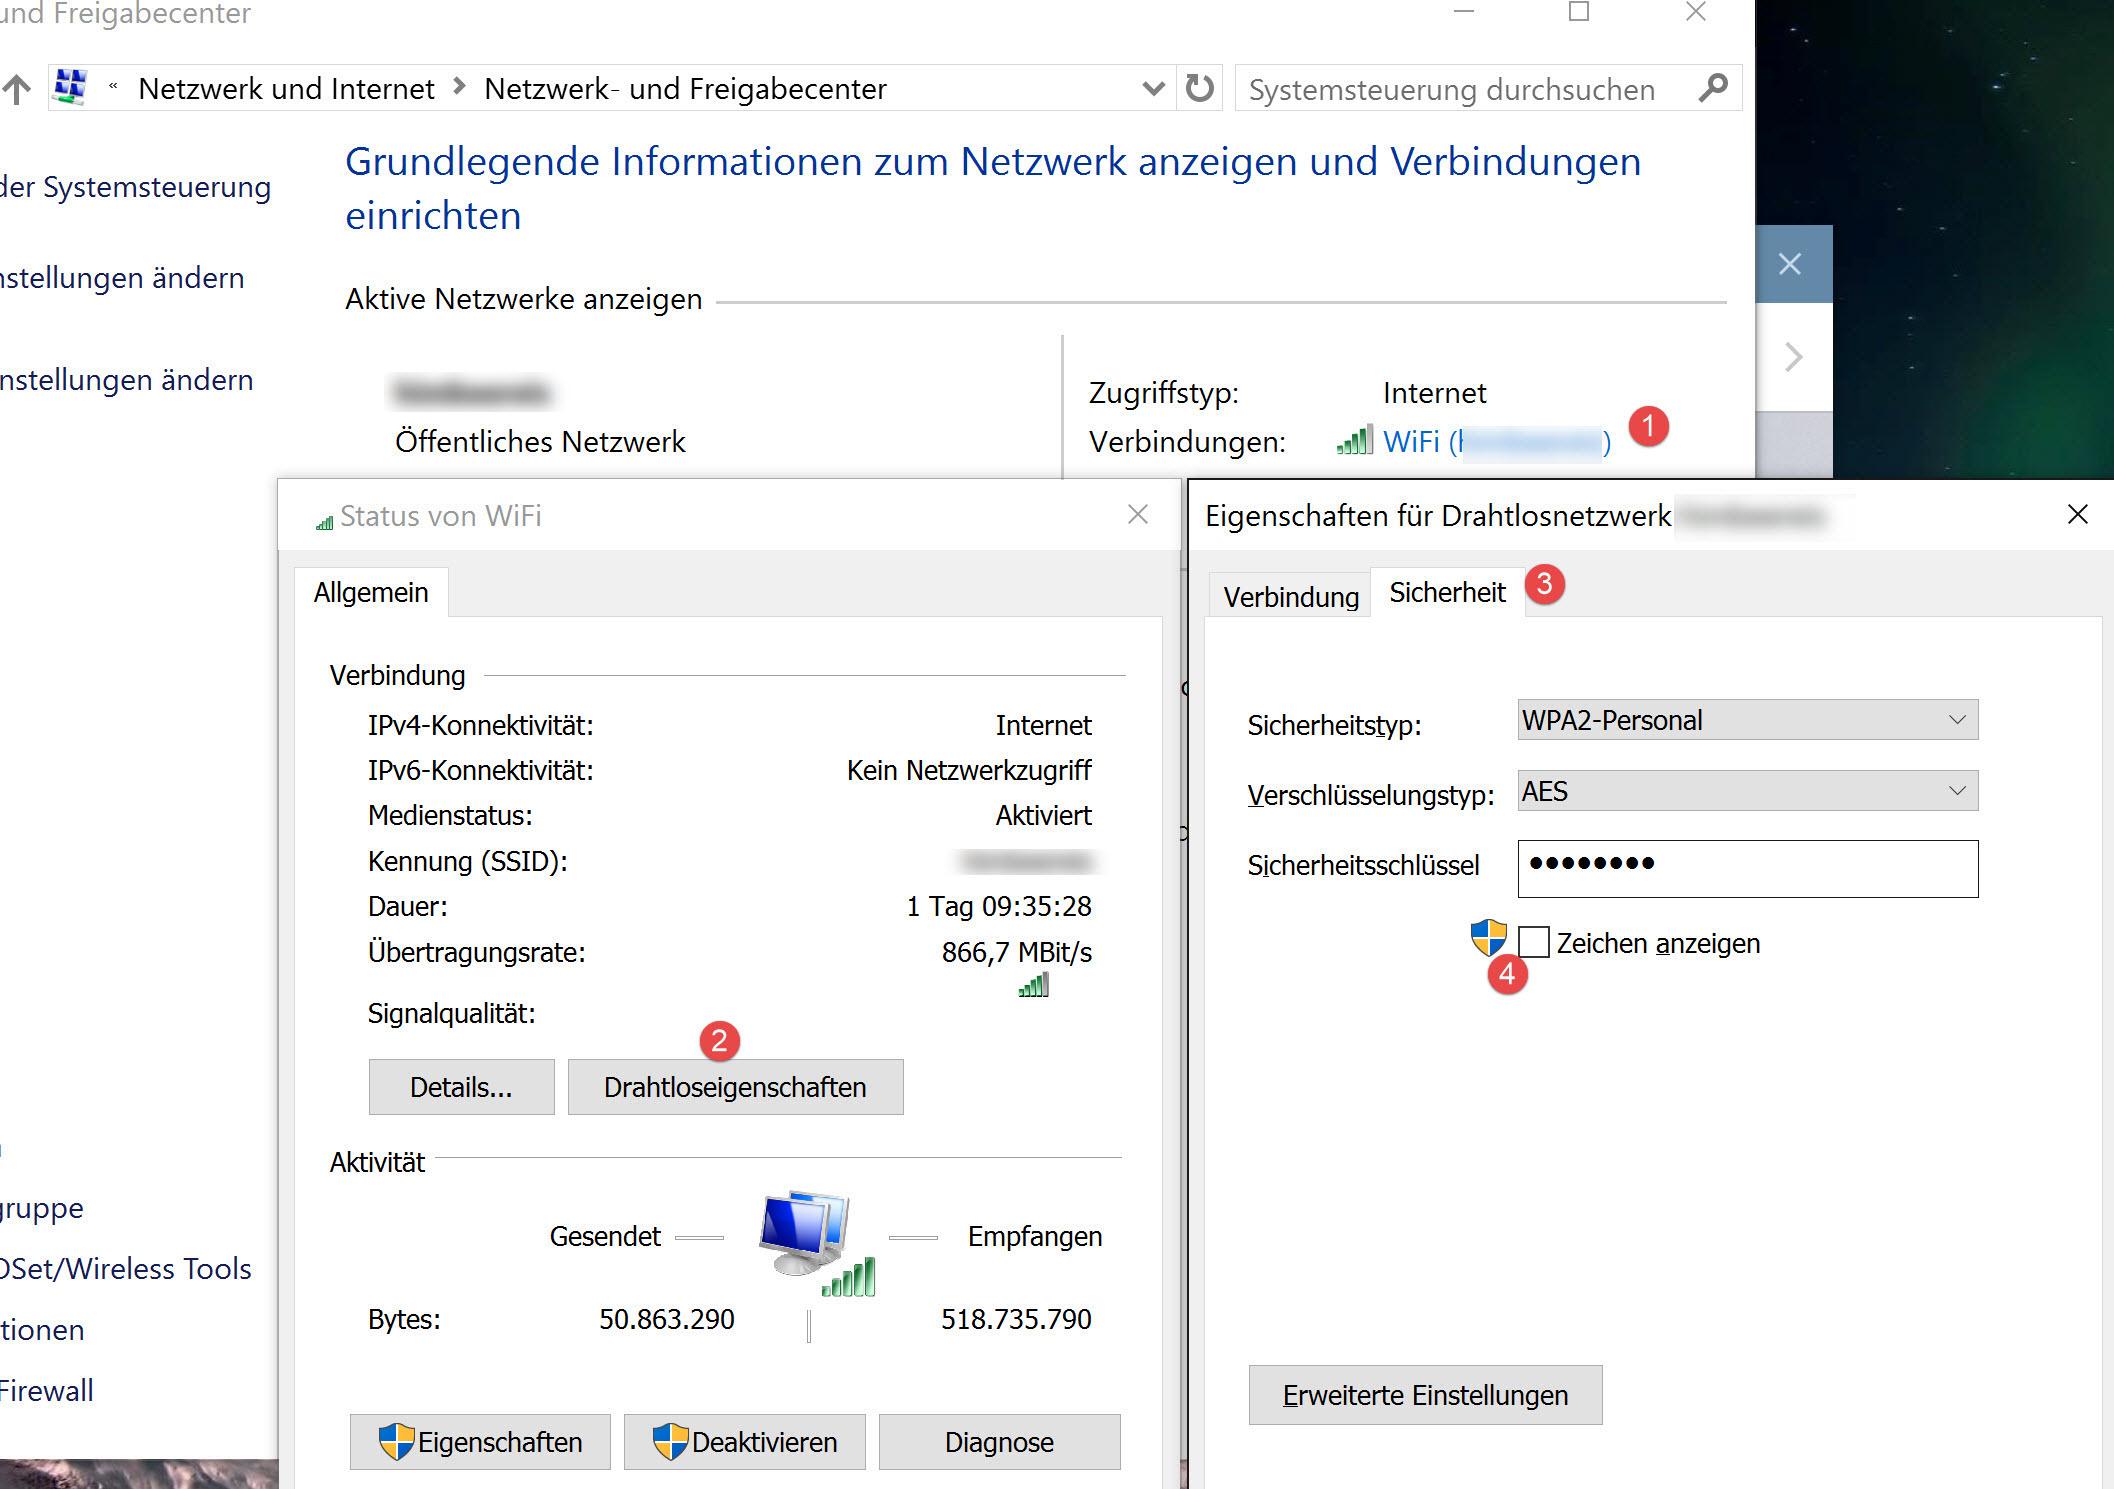 WLAN Passwort auslesen unter Windows